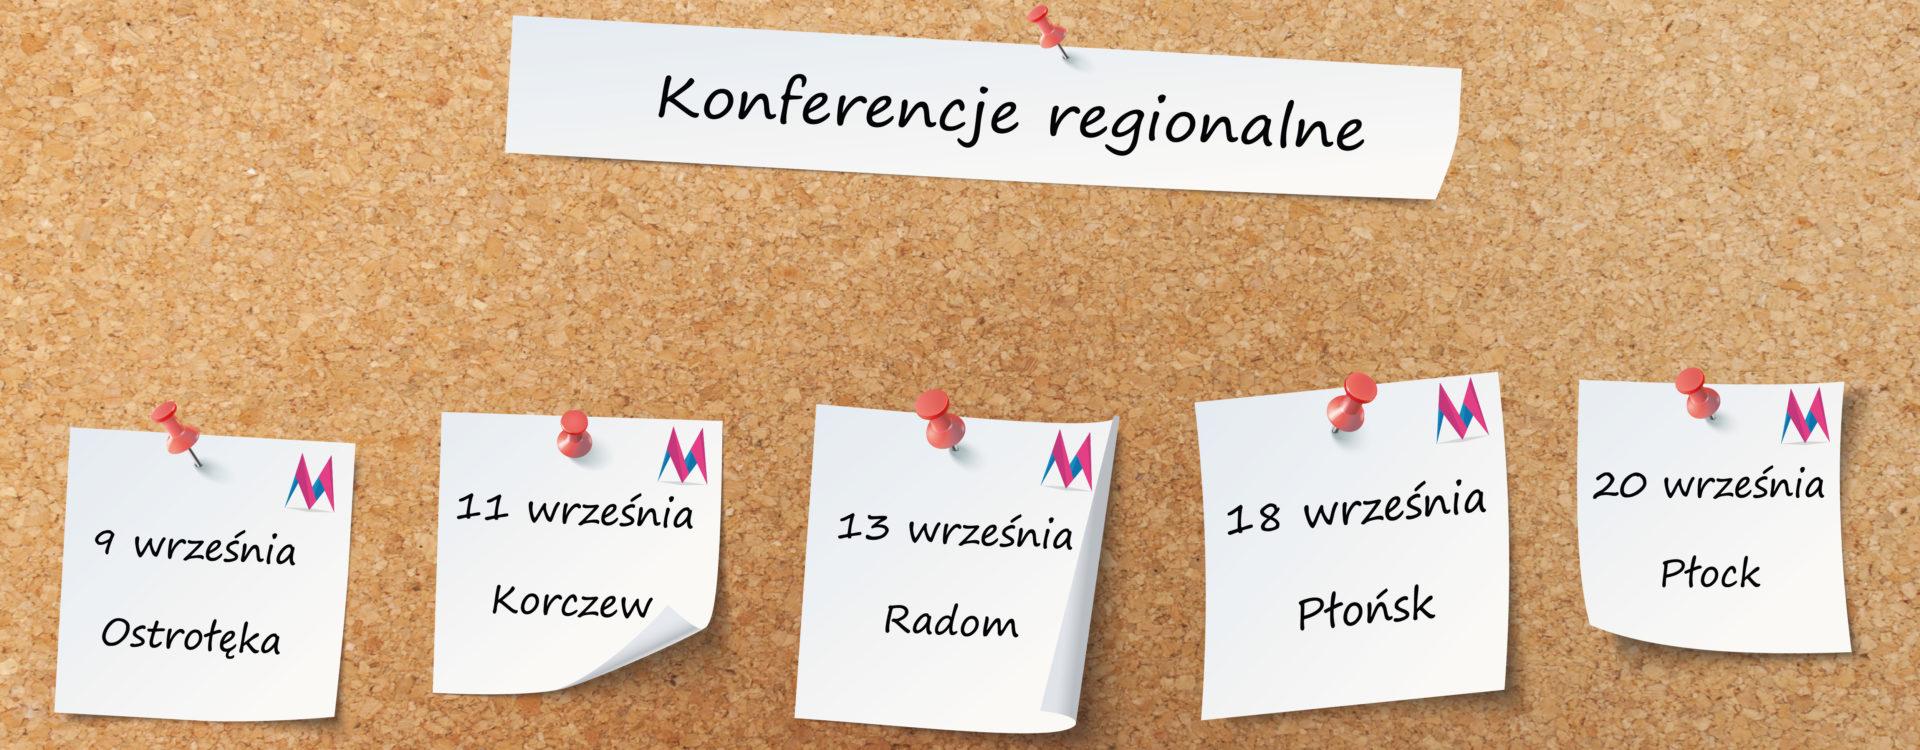 Konferencje regional